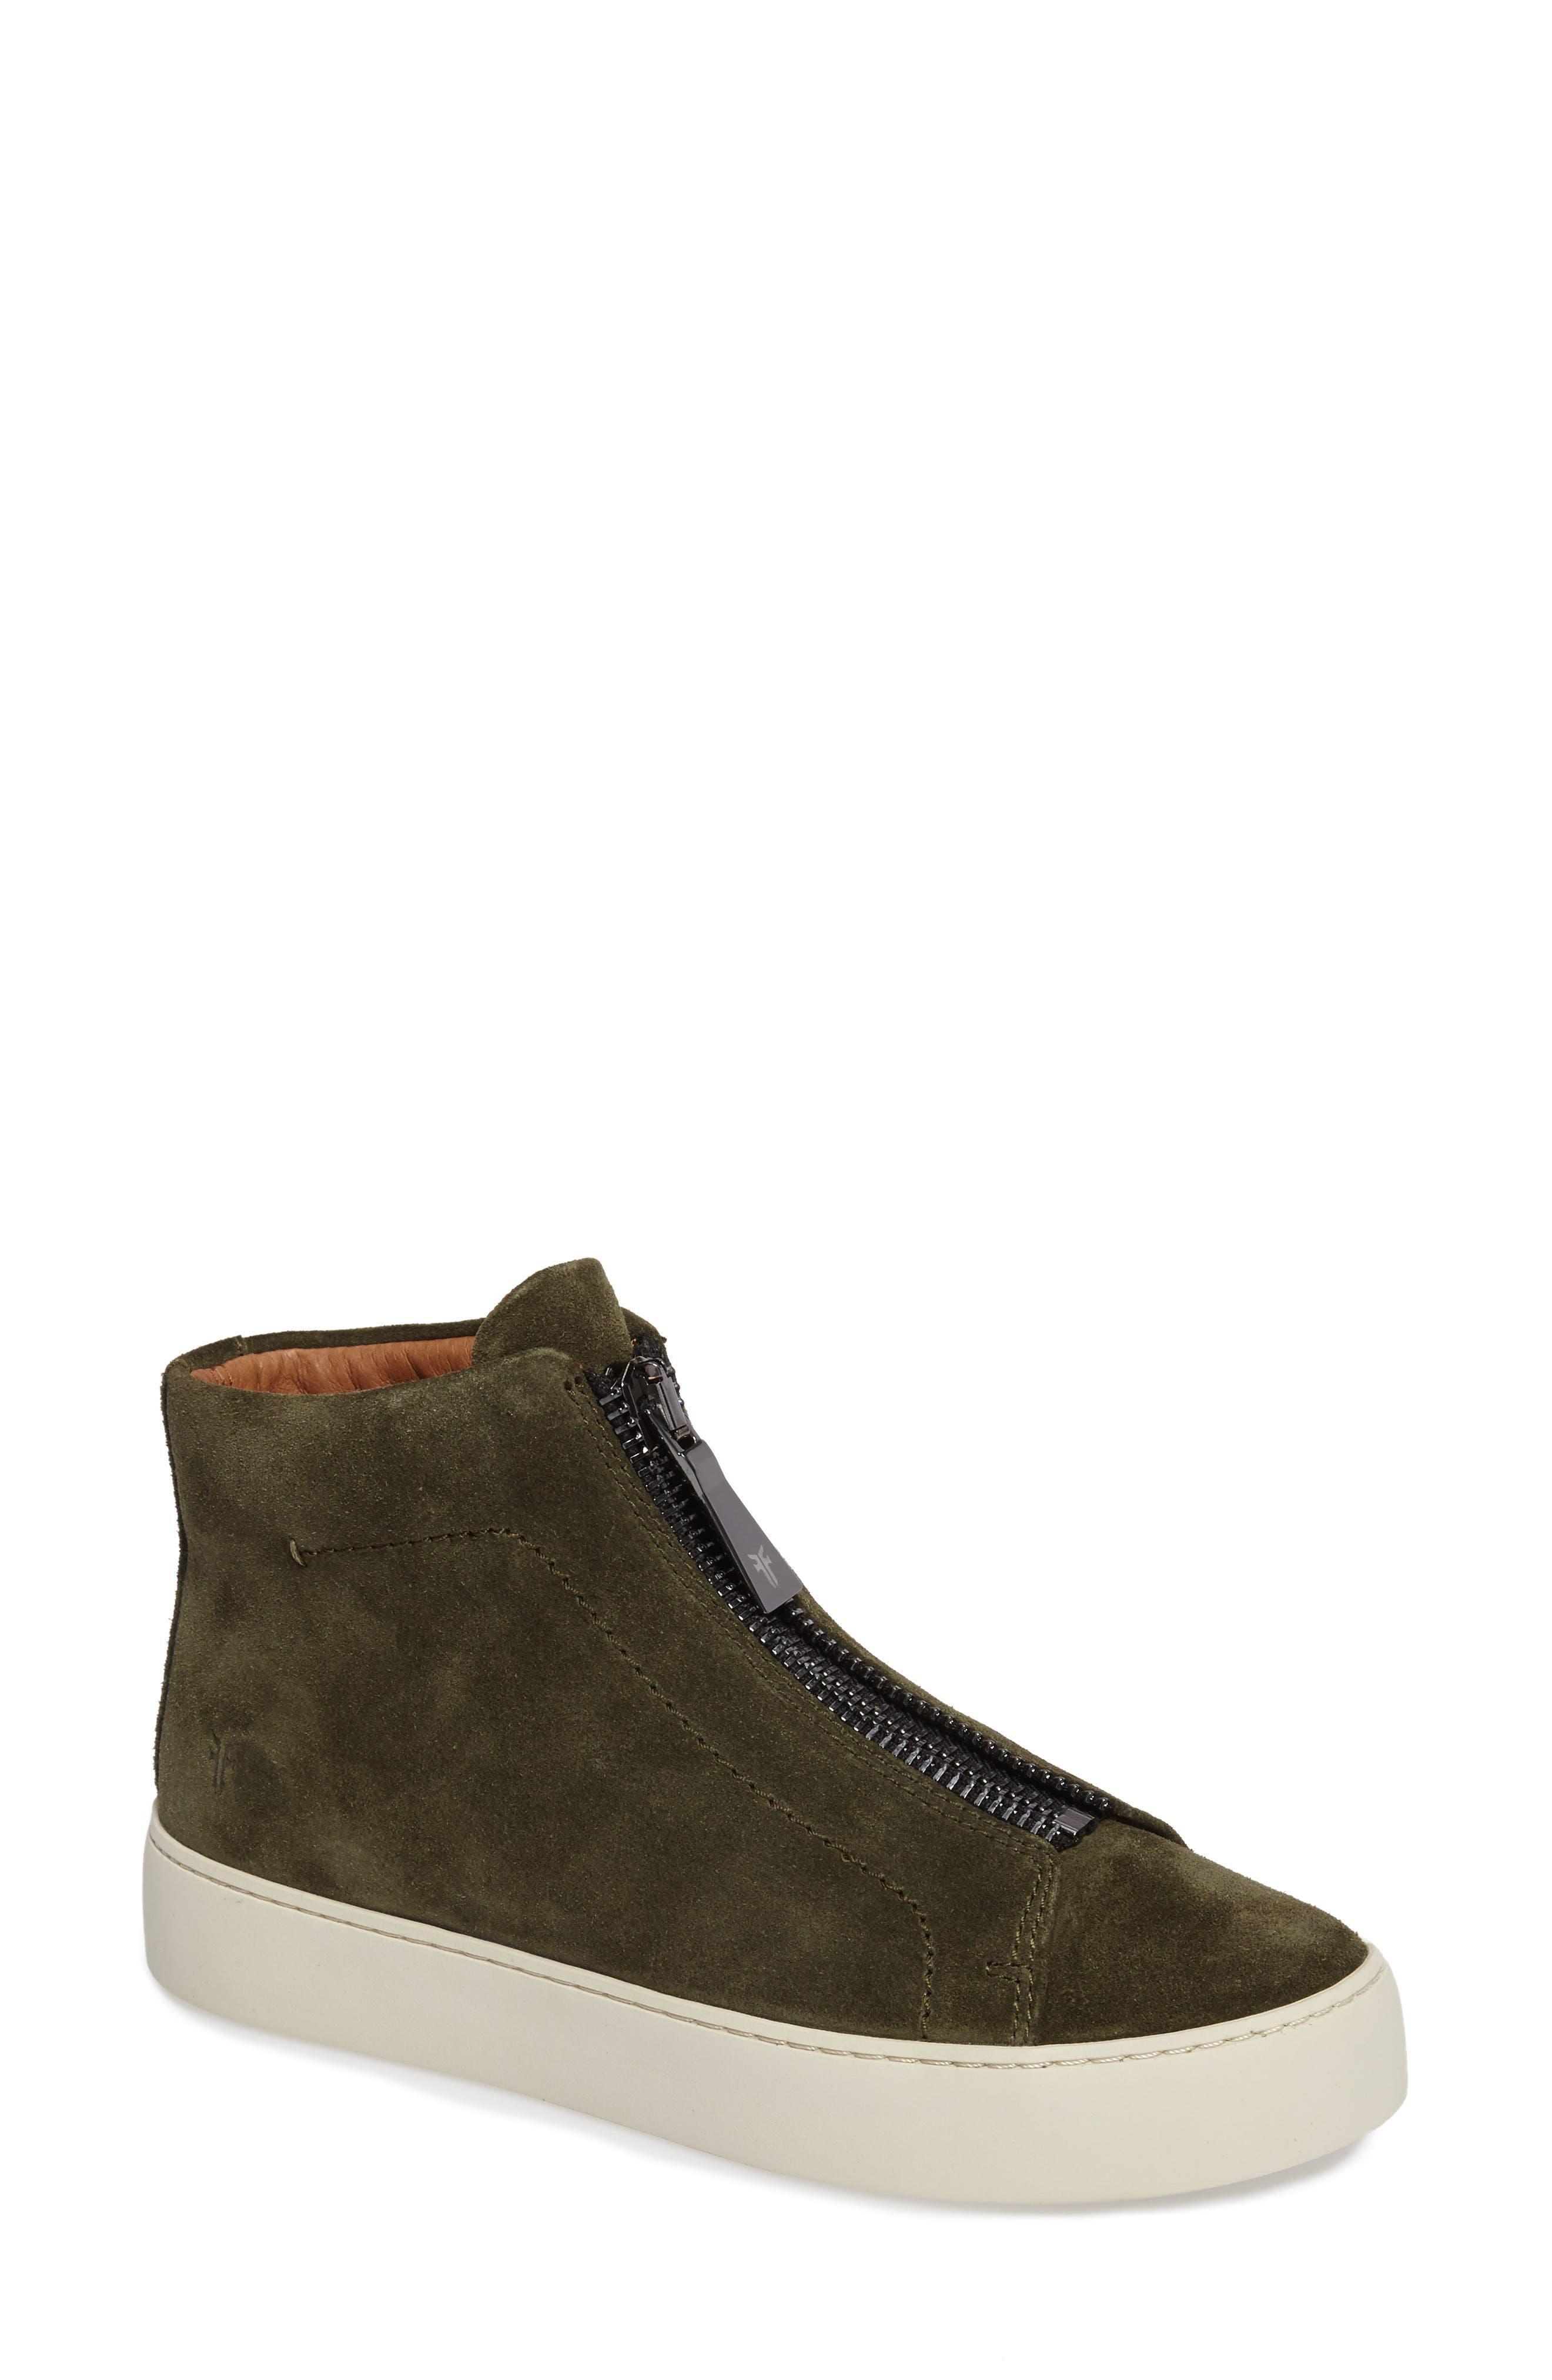 Lena Zip High Top Sneaker,                         Main,                         color, Forest Suede